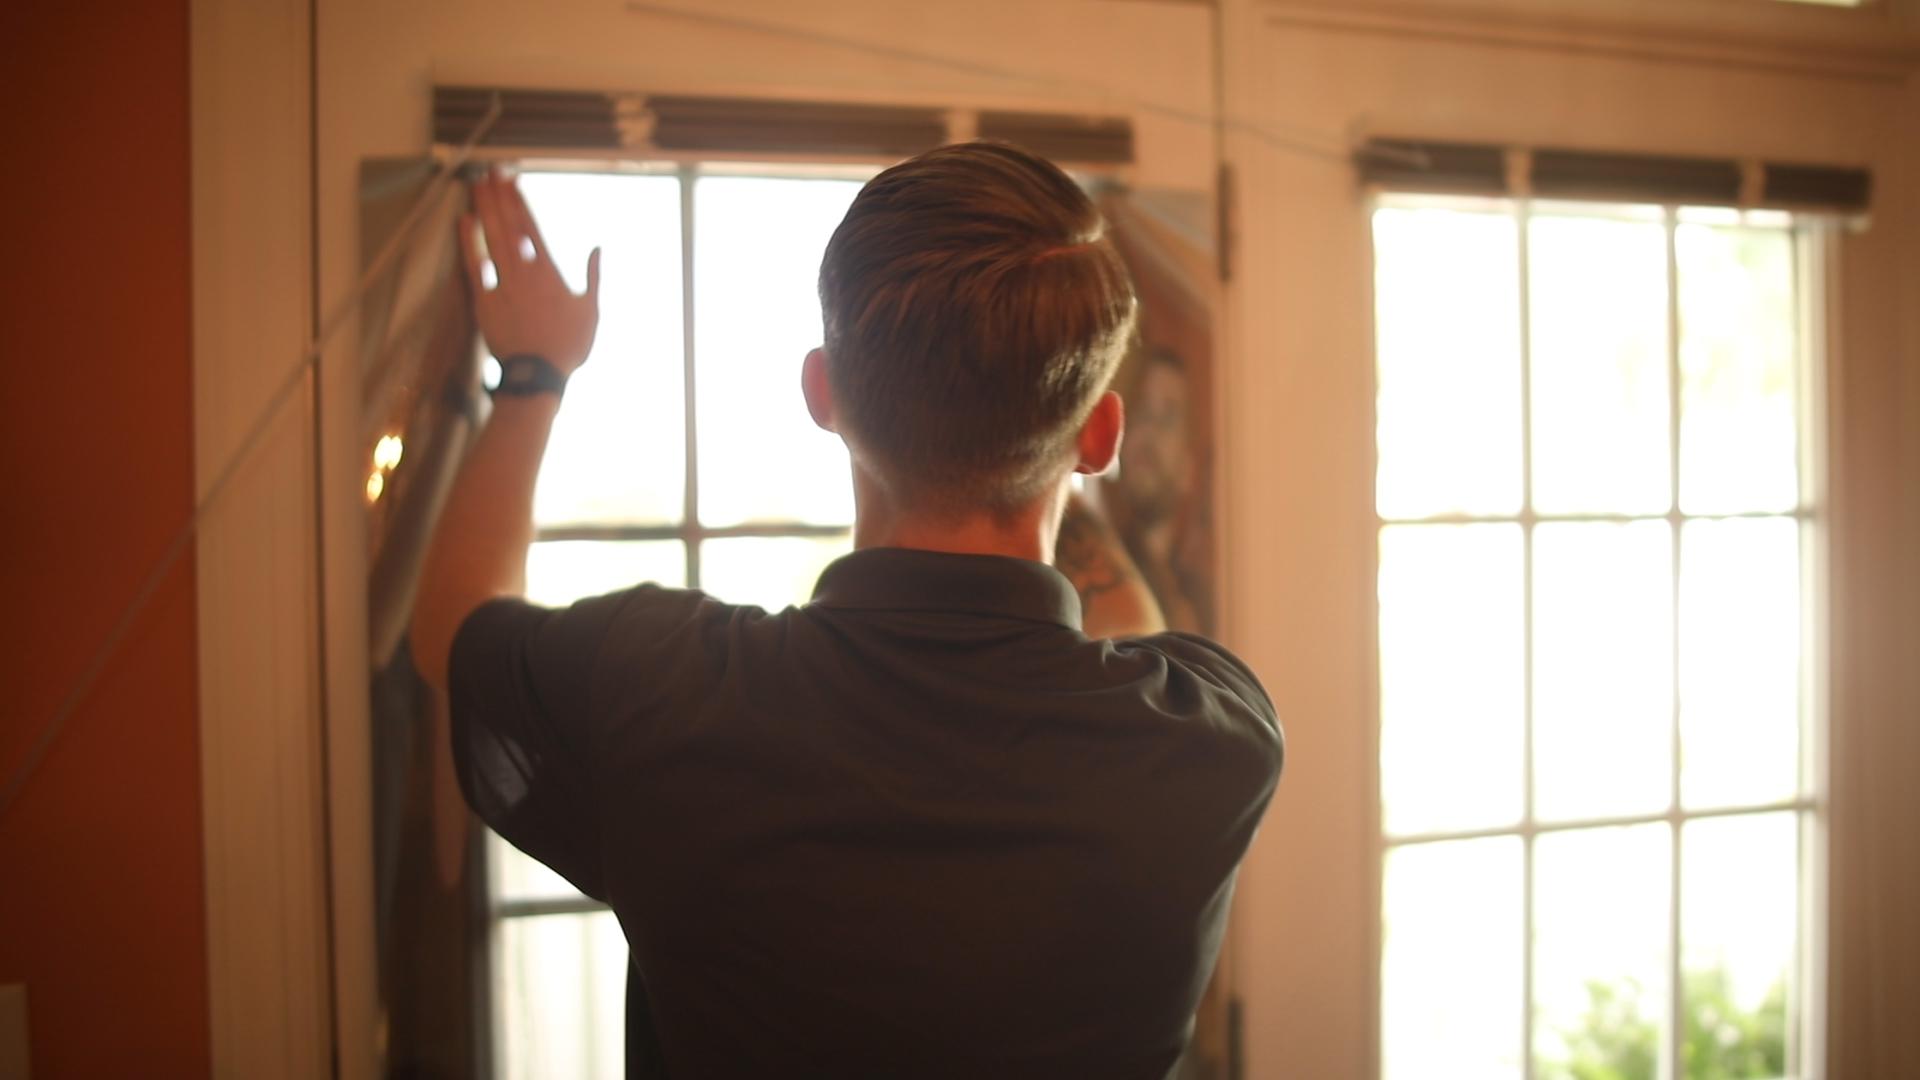 AP Installer Tints Residential Window